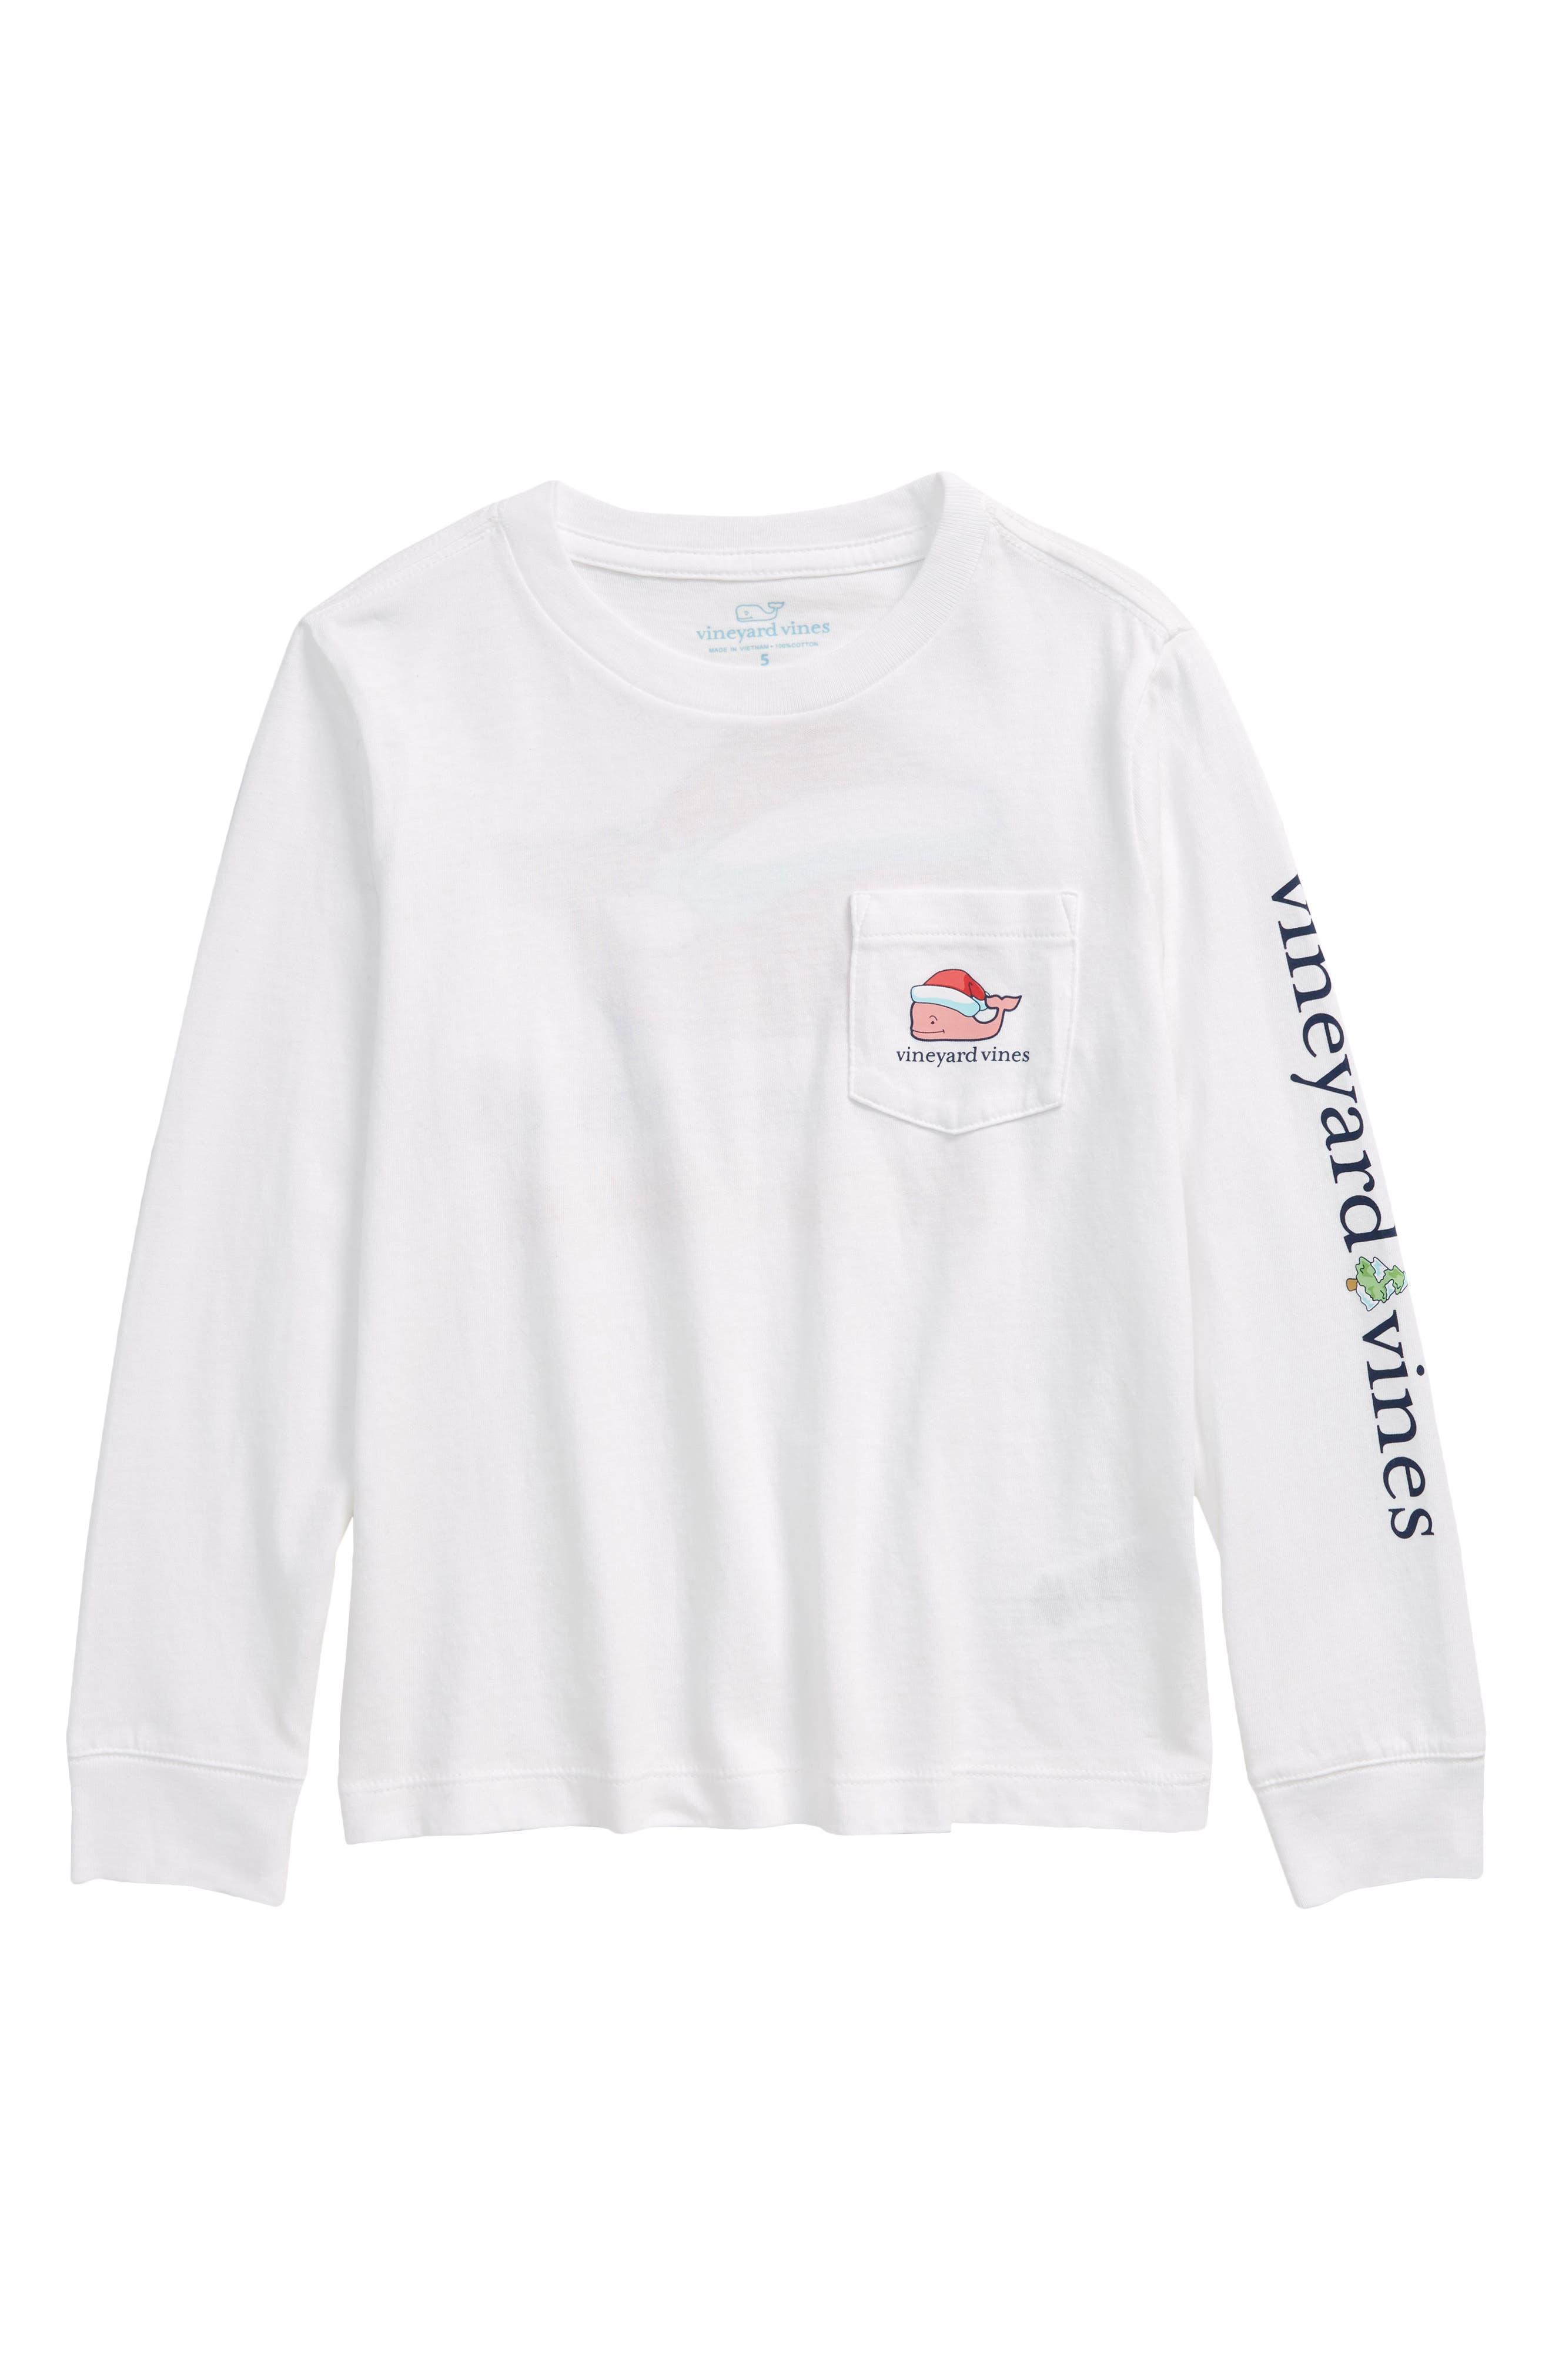 Toddler Boy's Vineyard Vines Kids' Christmas Whale Long Sleeve Pocket T-Shirt, Size 4T - White